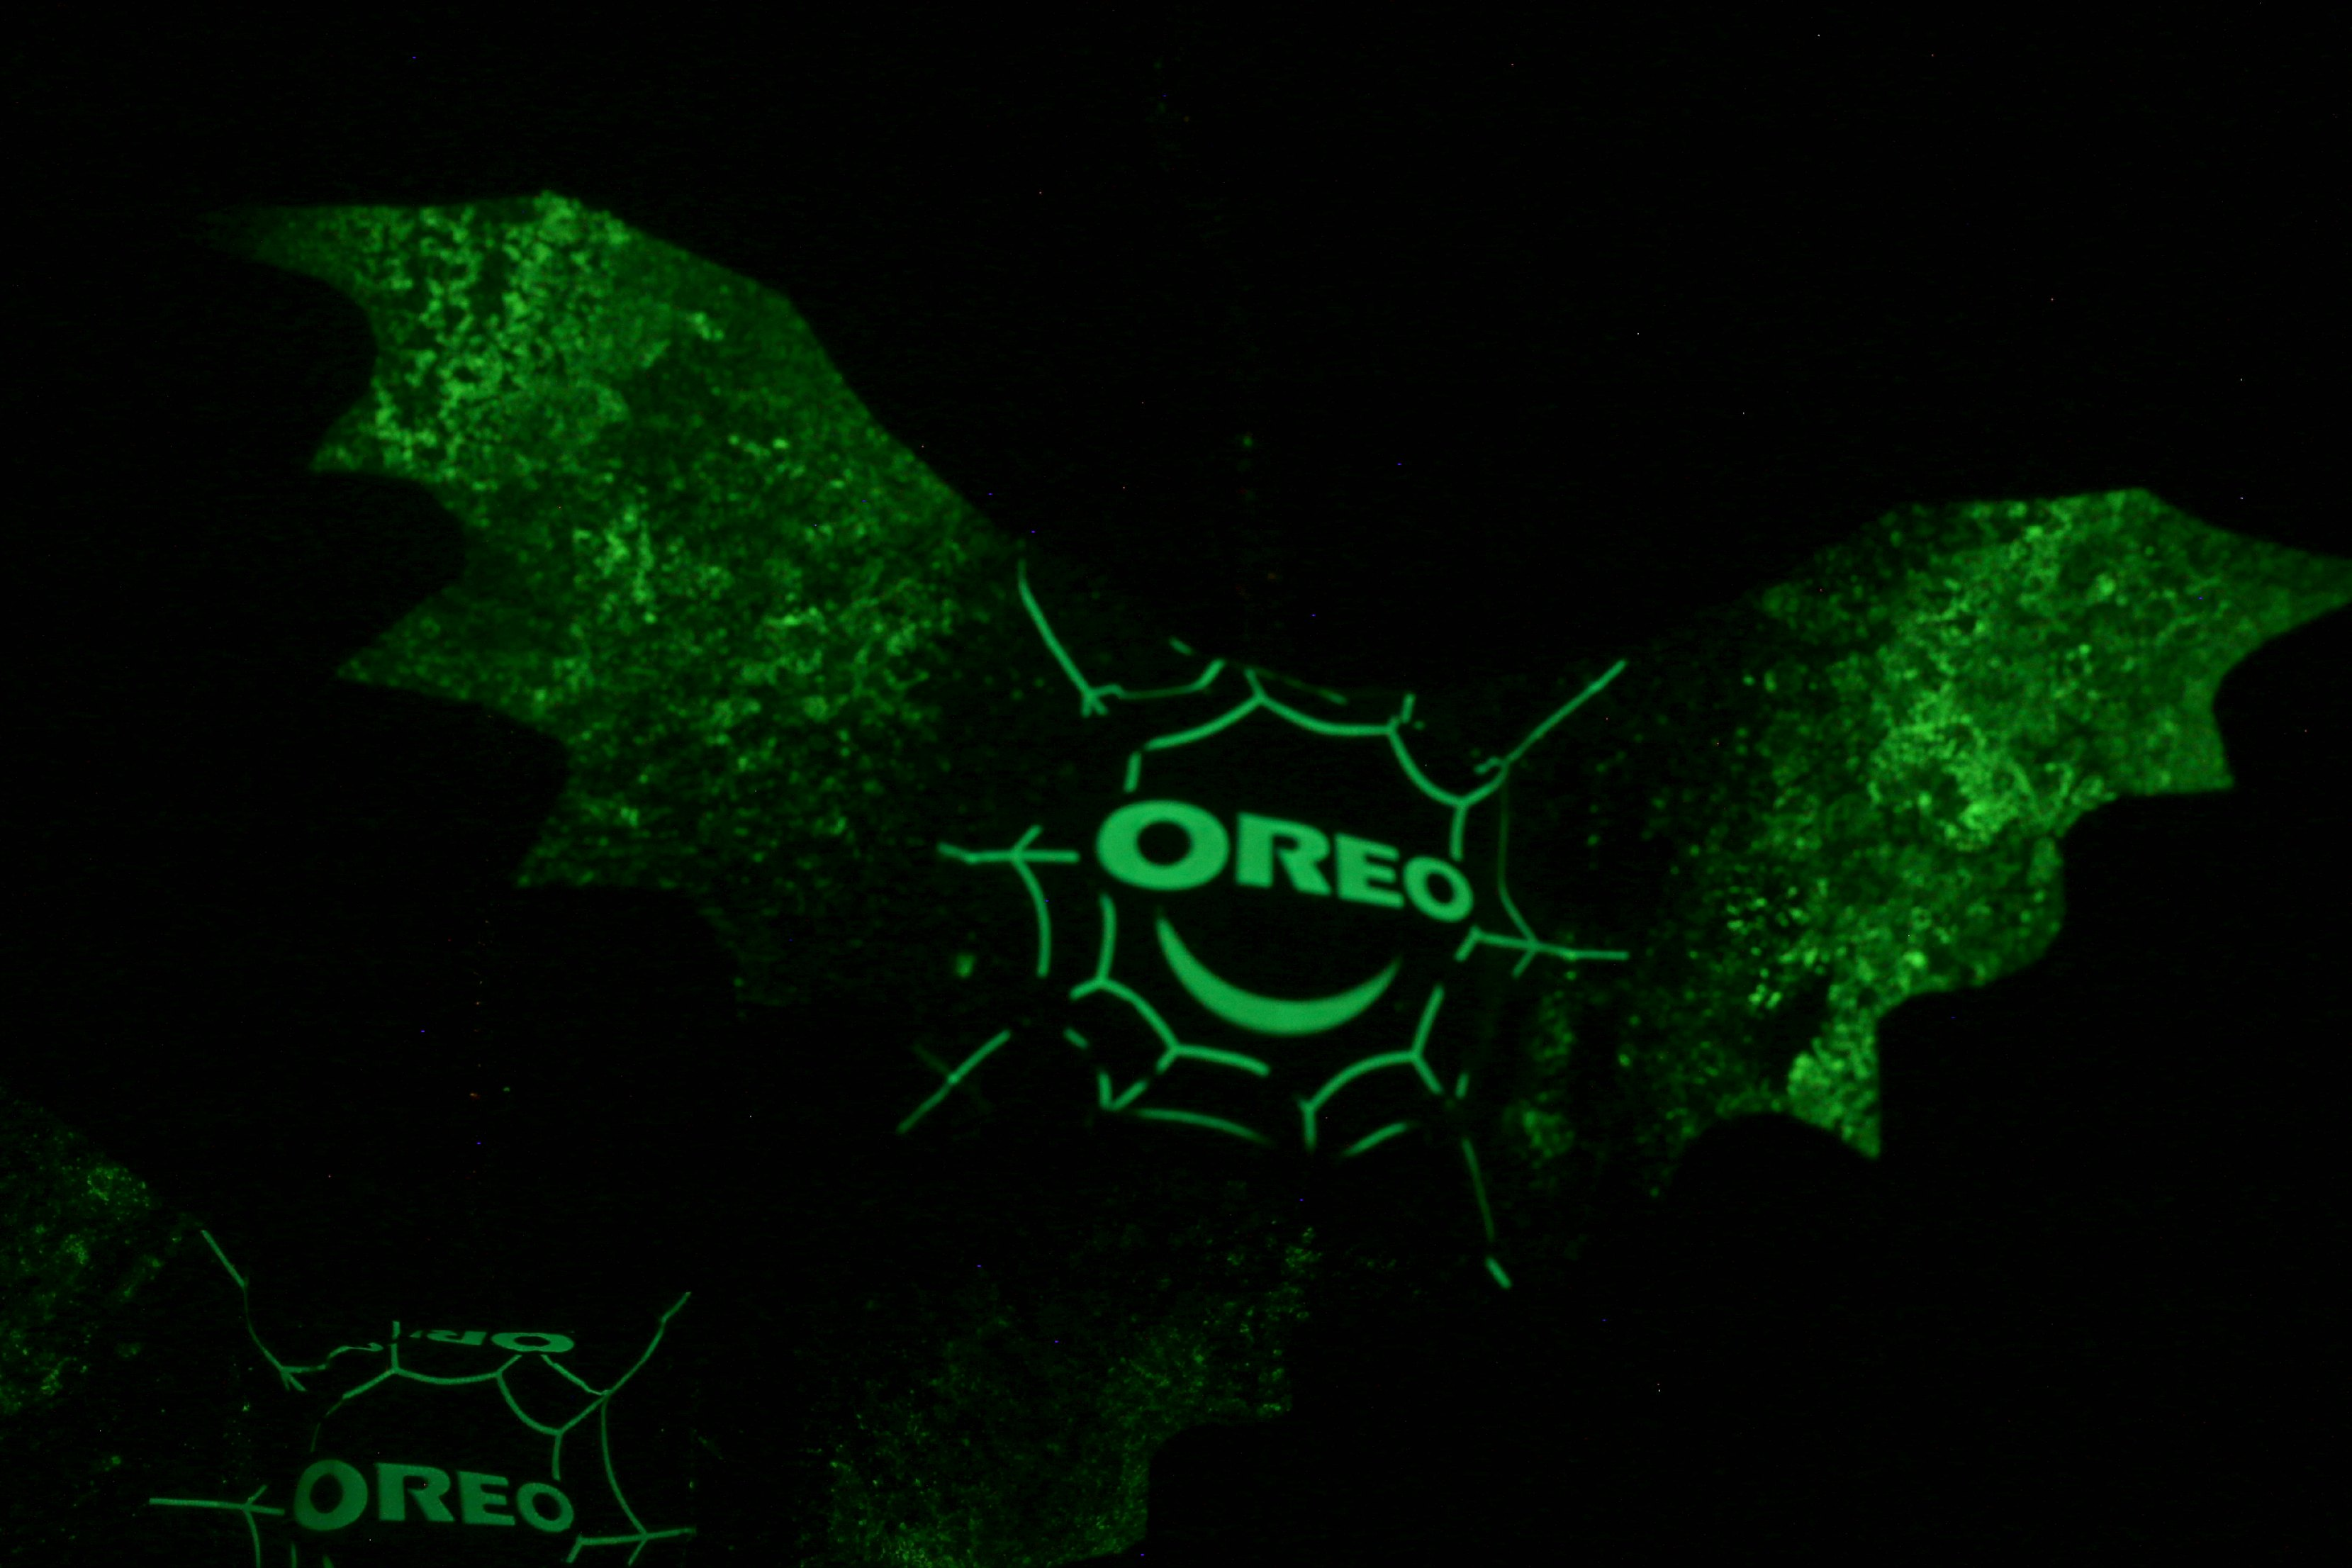 oreo glow in the dark bats